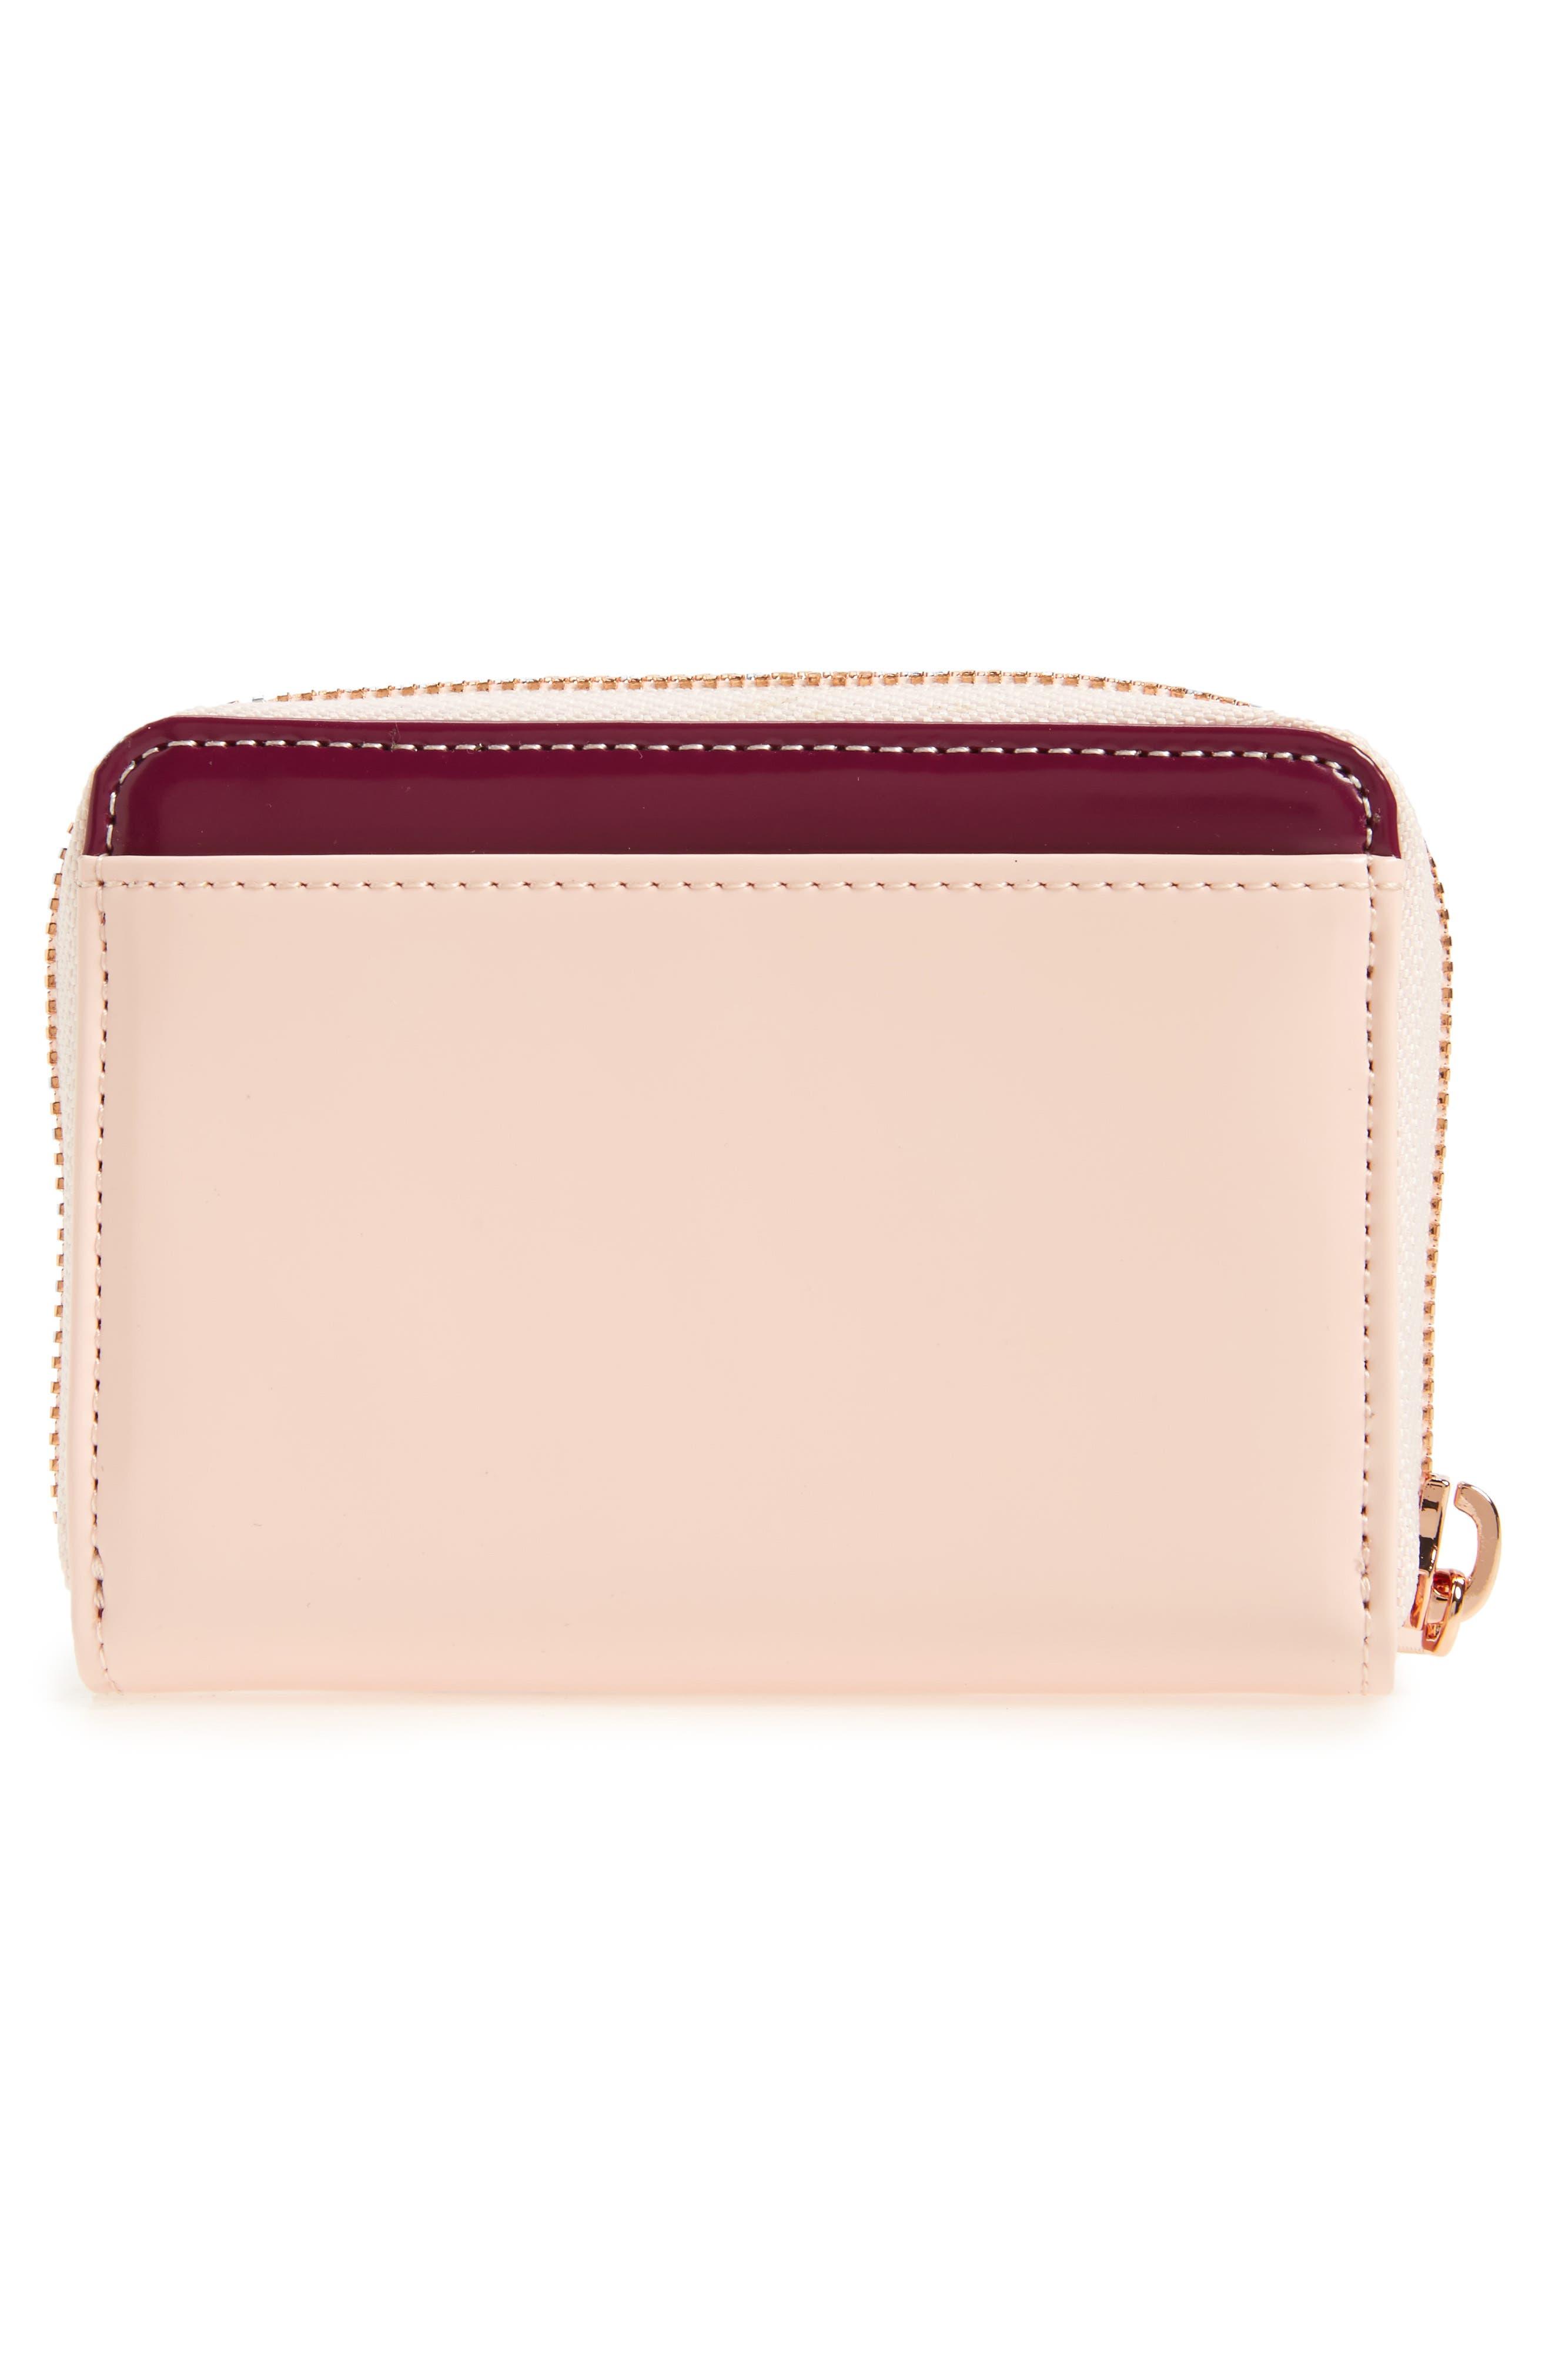 Beryl Leather Mini Purse,                             Alternate thumbnail 3, color,                             Baby Pink